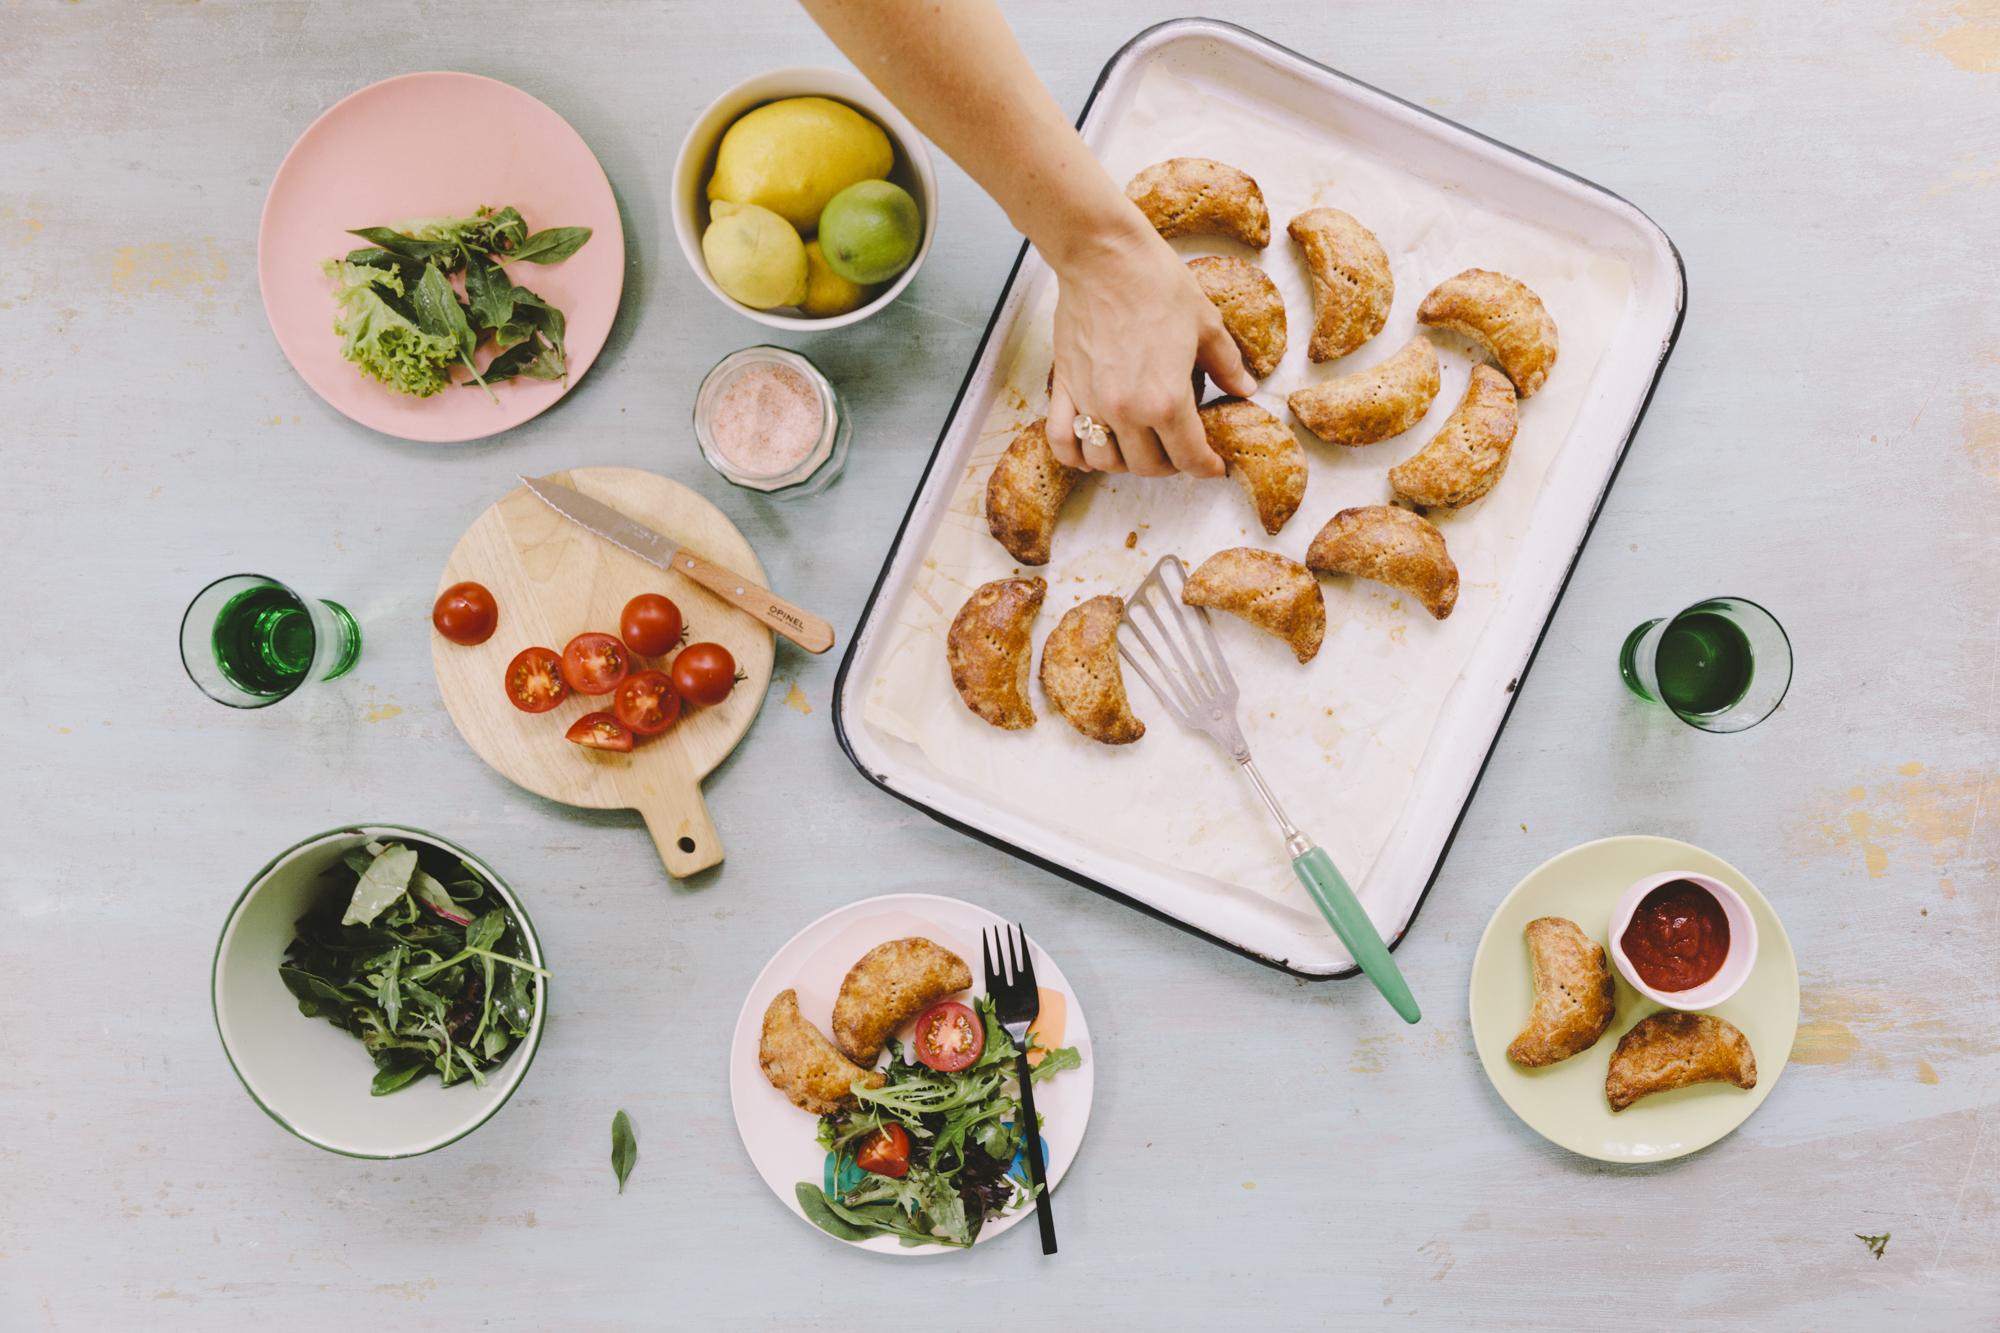 lunch lady food photography australia.jpg